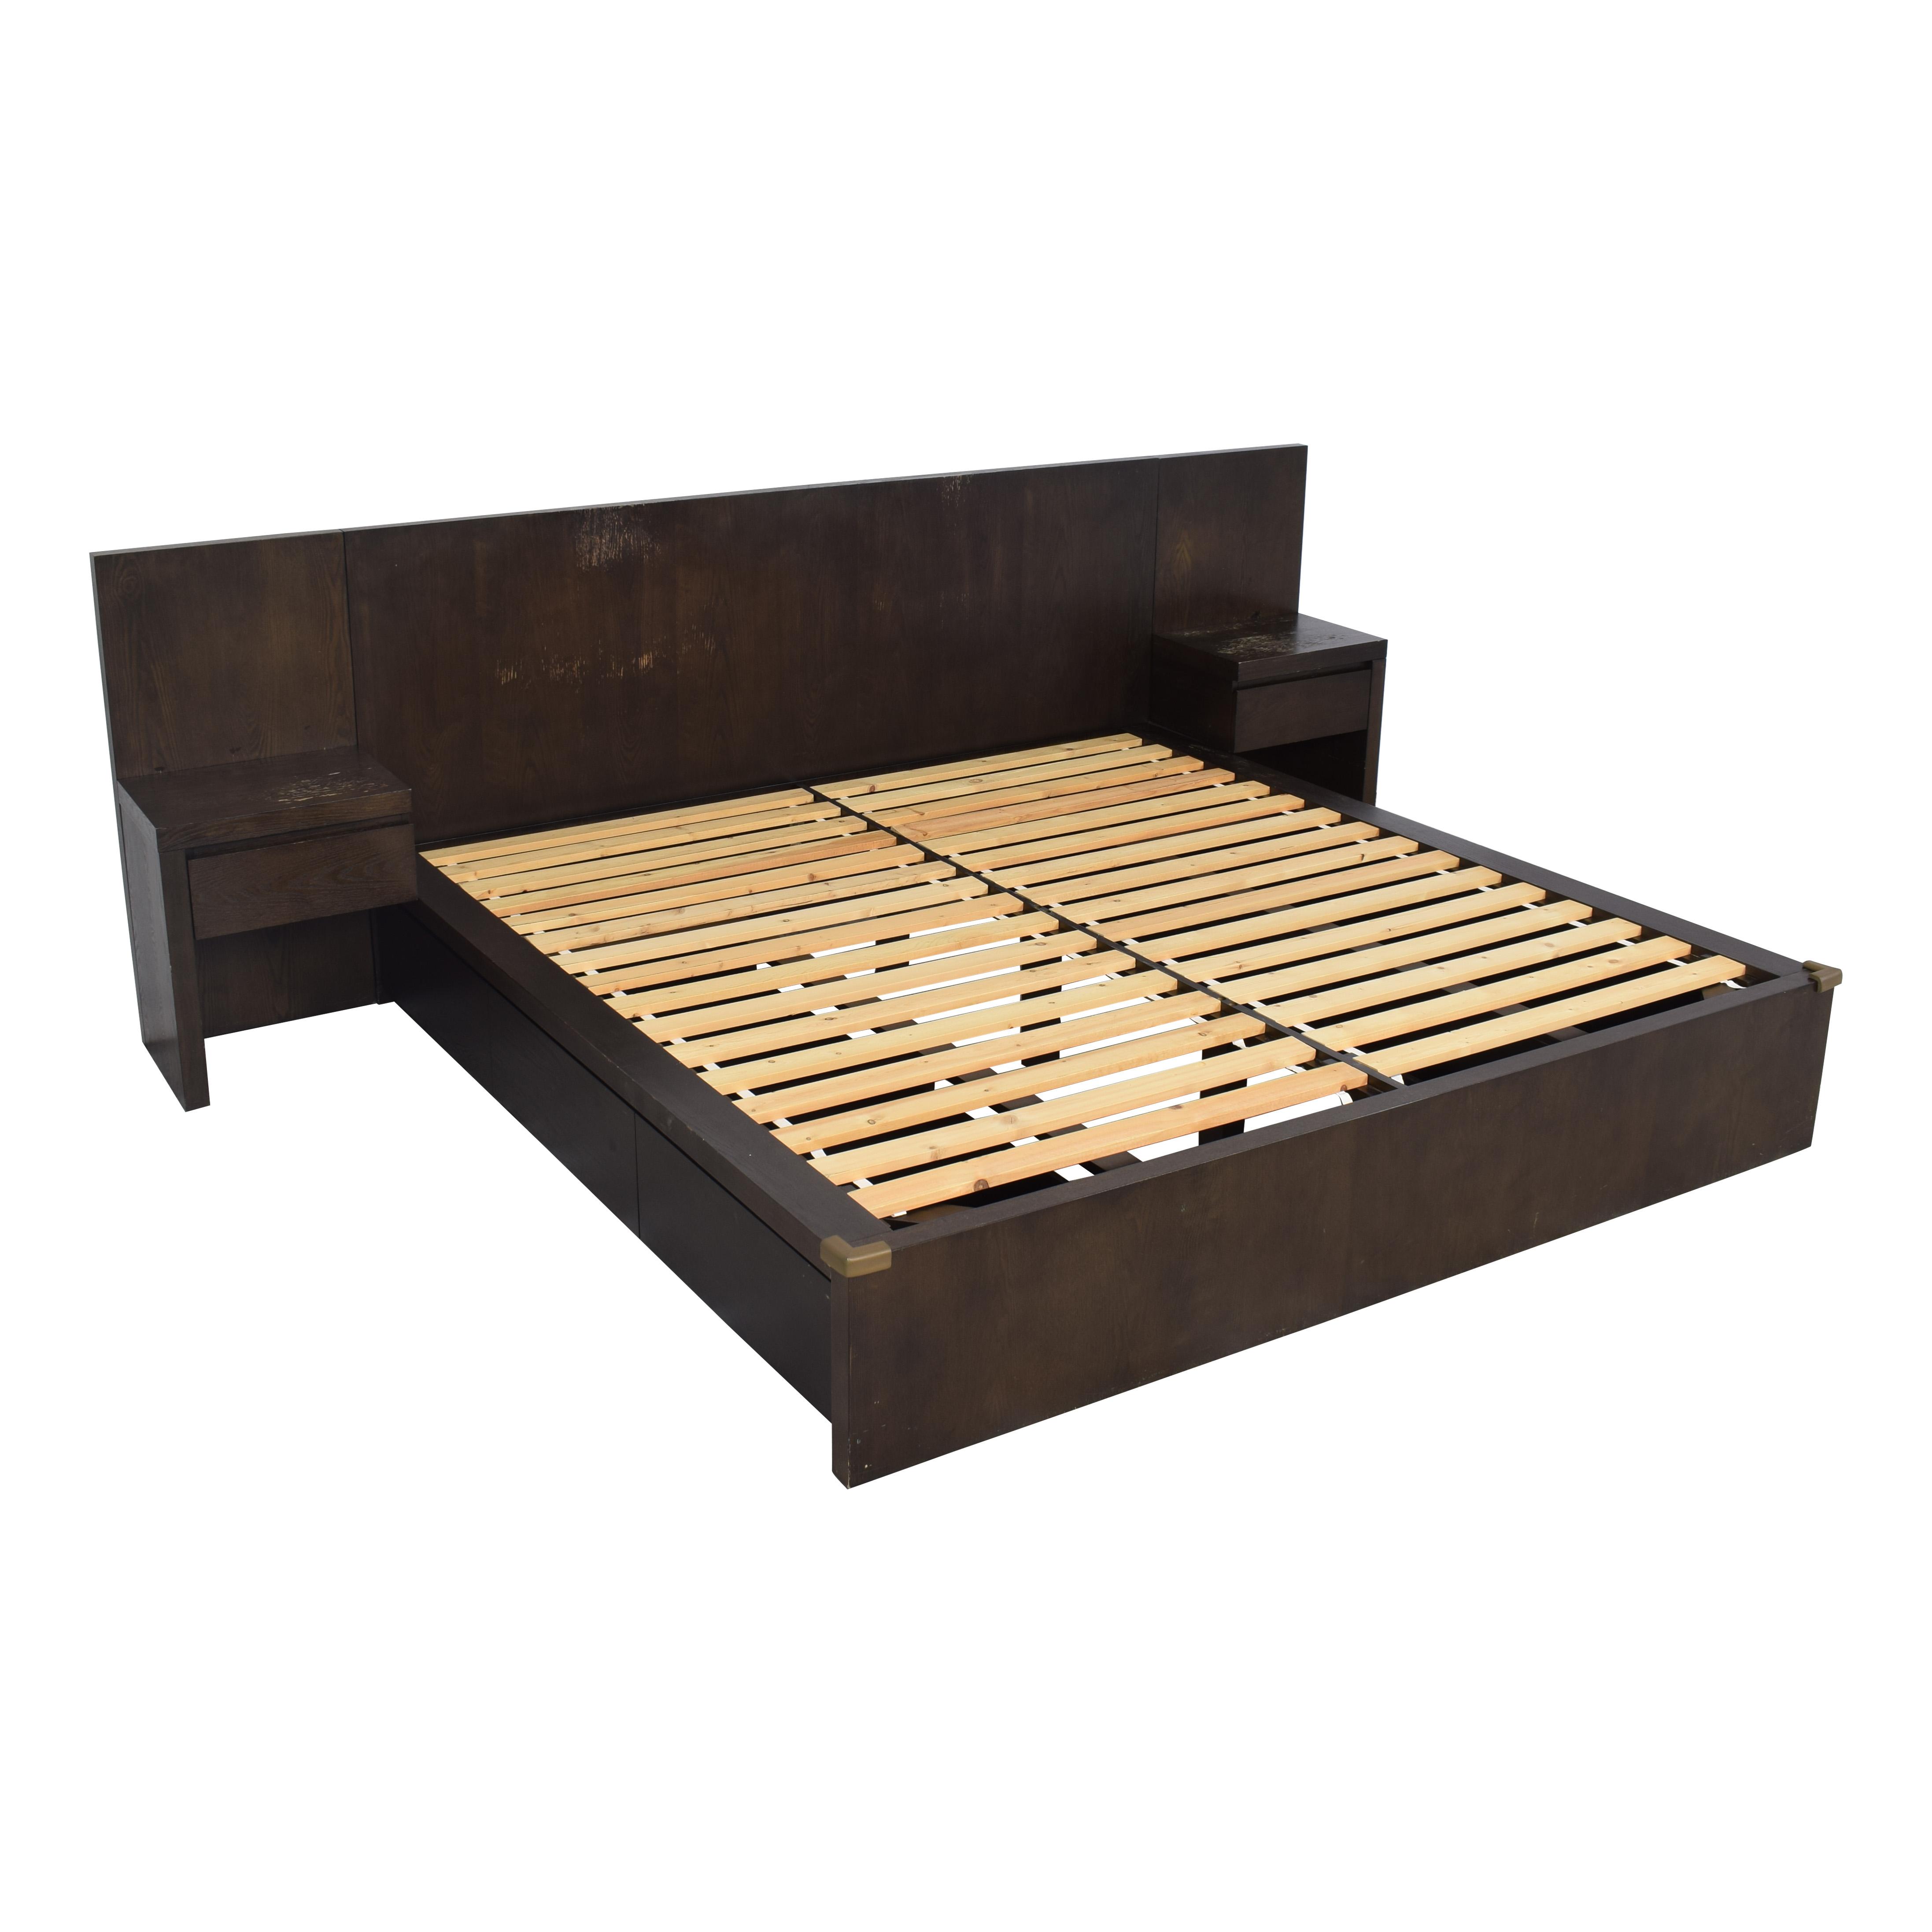 West Elm West Elm King Storage Bed with Nightstands discount